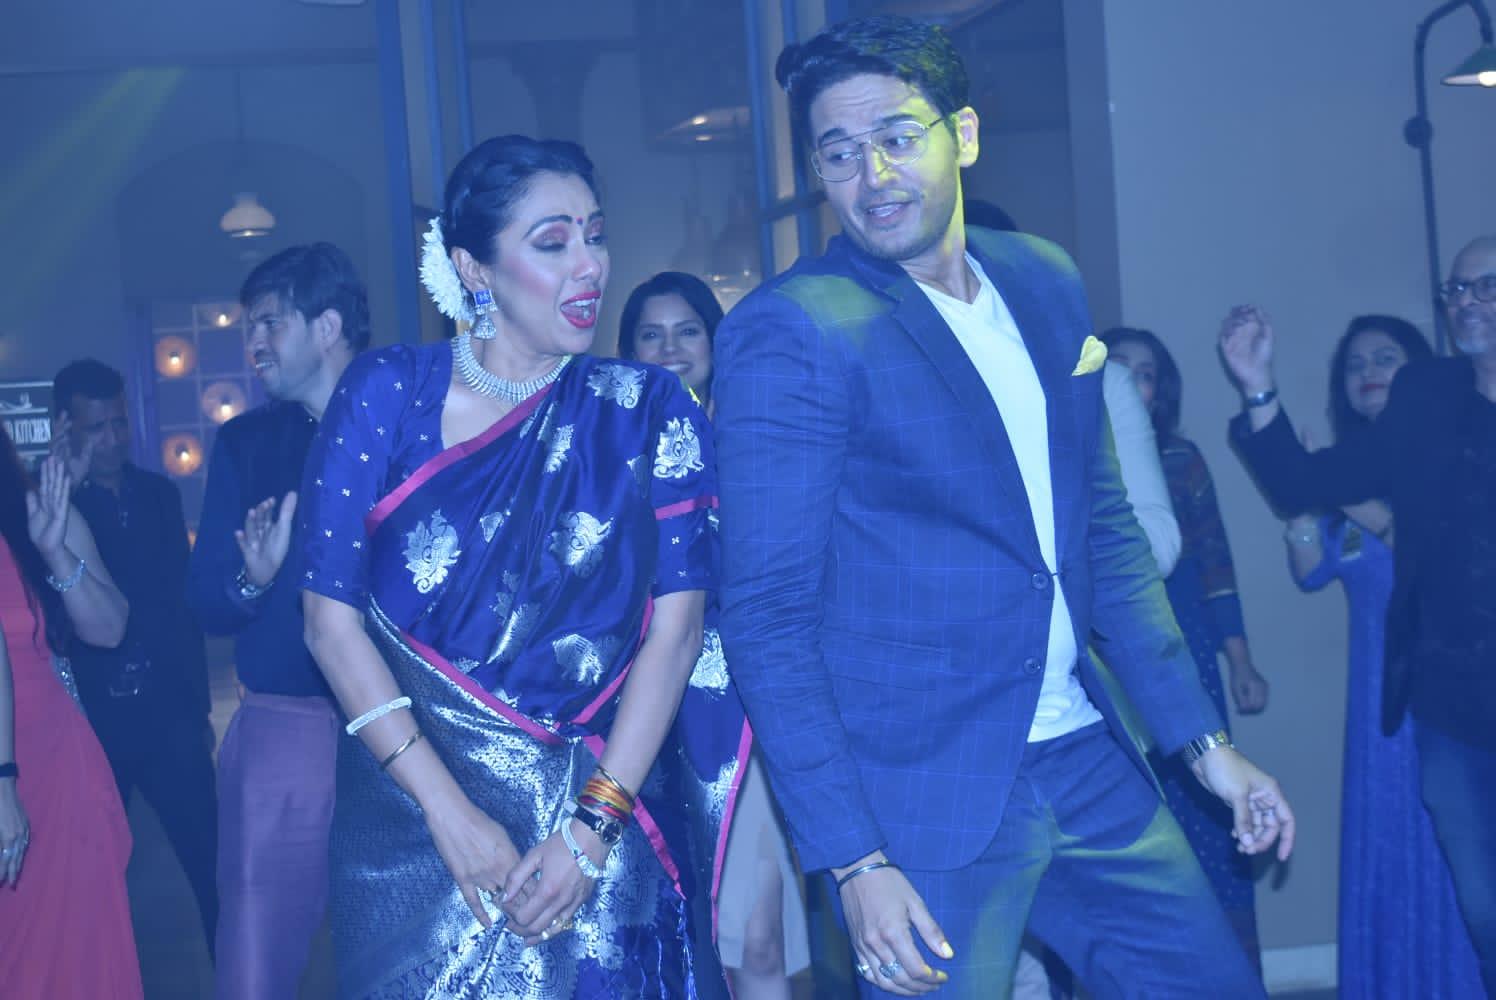 Anupama dances with Anuj Kapadia in the upcoming episode (Picture Credits: Prashant Golecha)